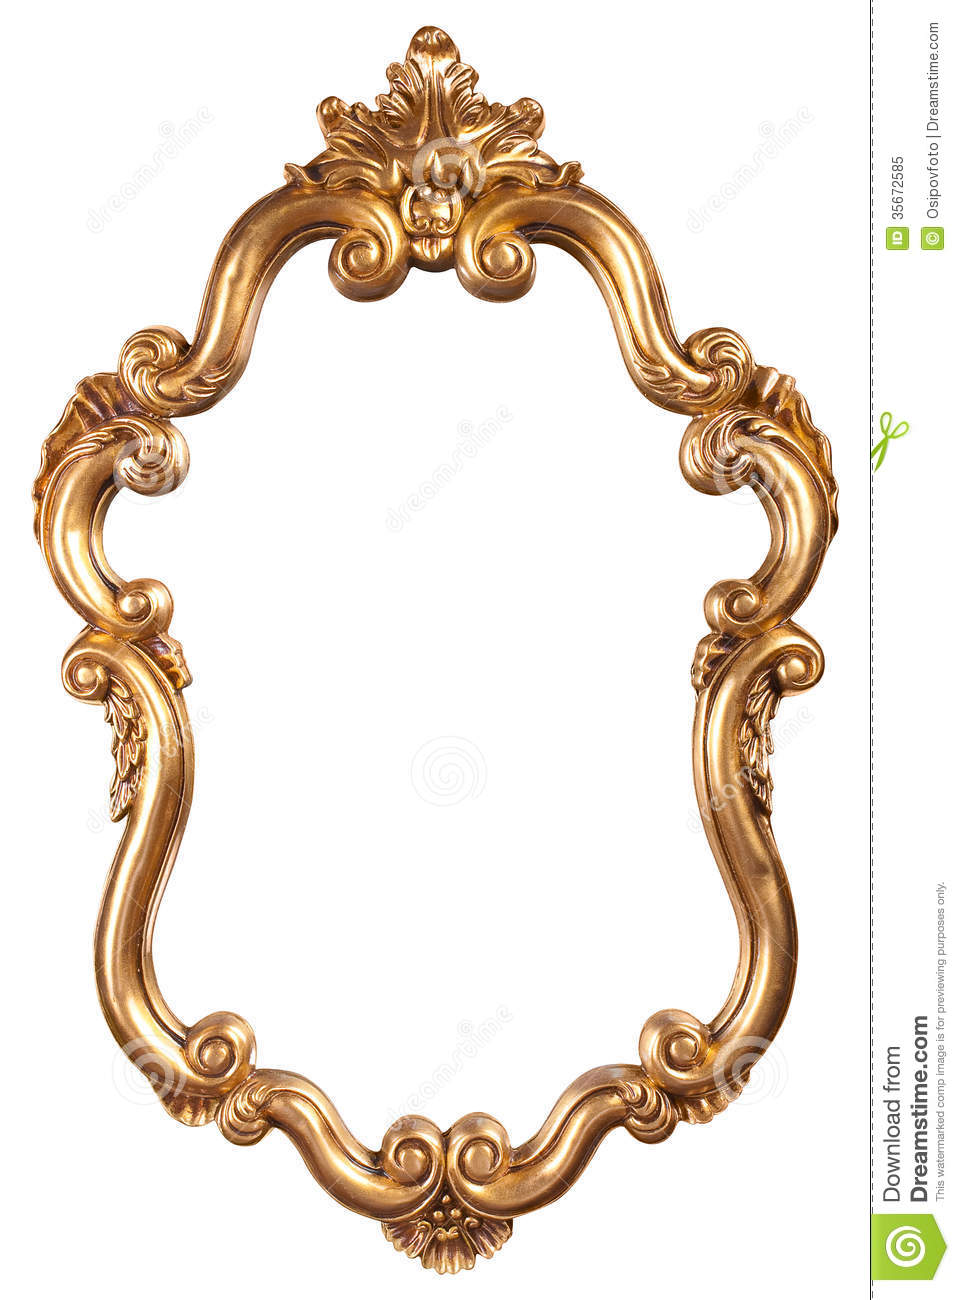 Mirror antique%20frame%20clipart%20gold Google Pinterest golden